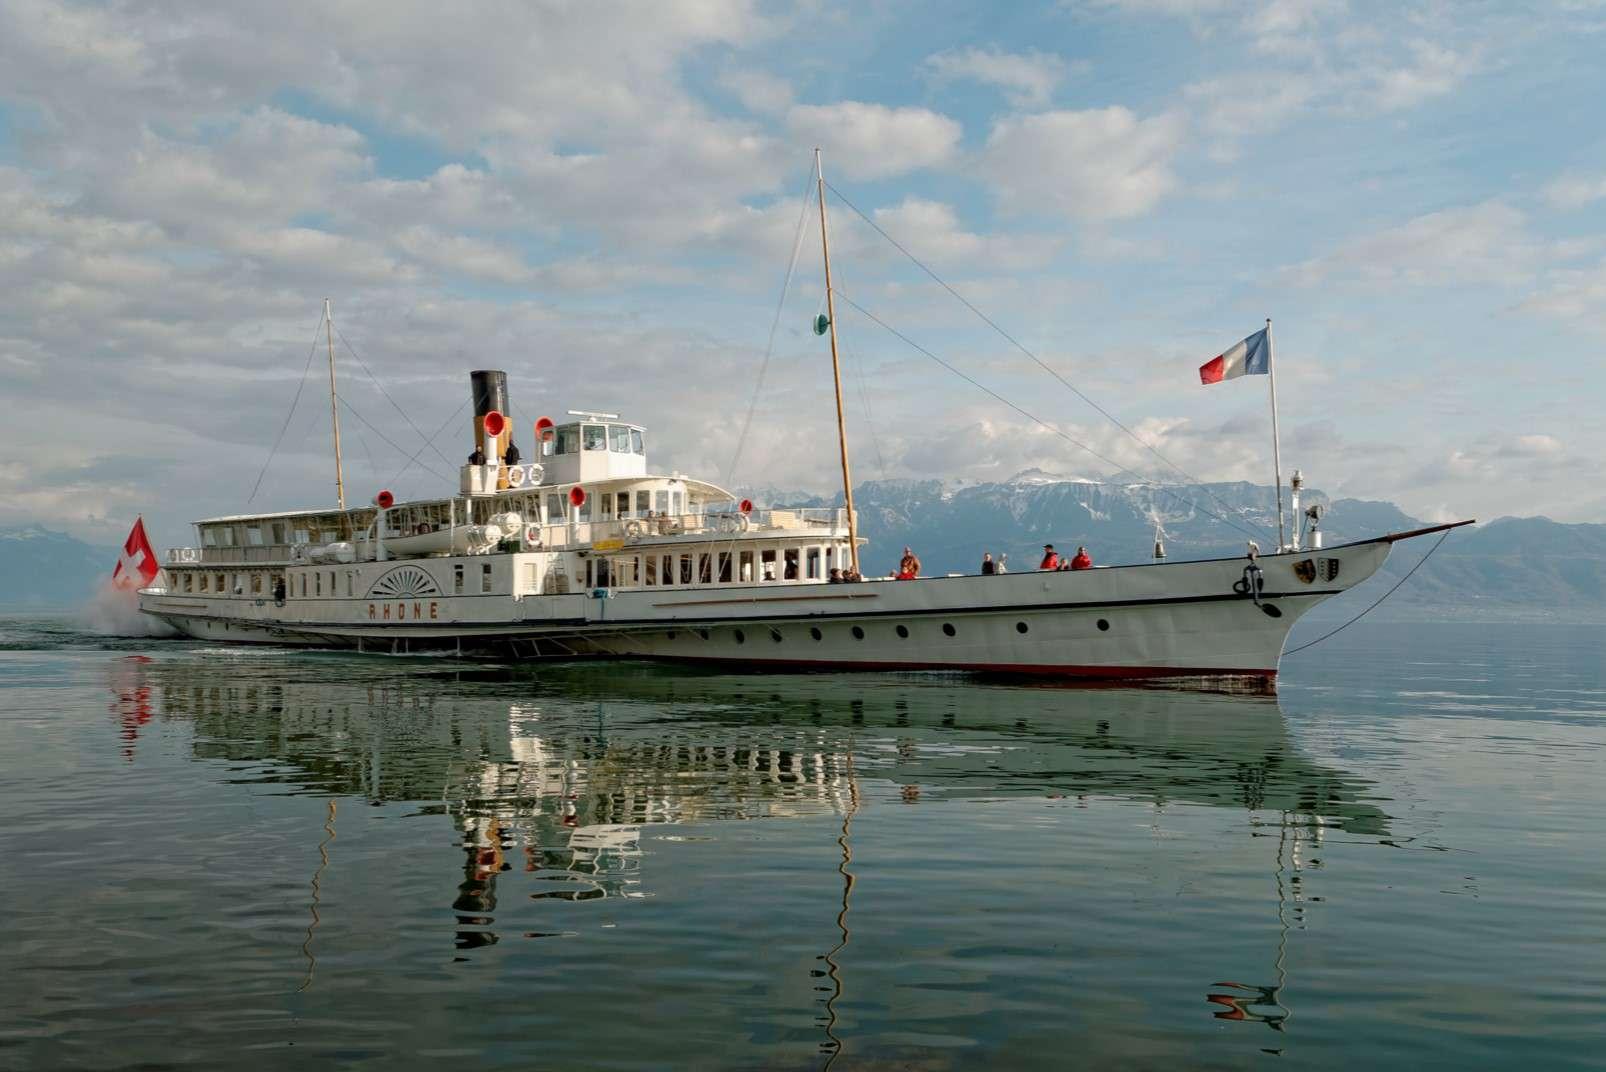 Geneva Rhone cruise ferry